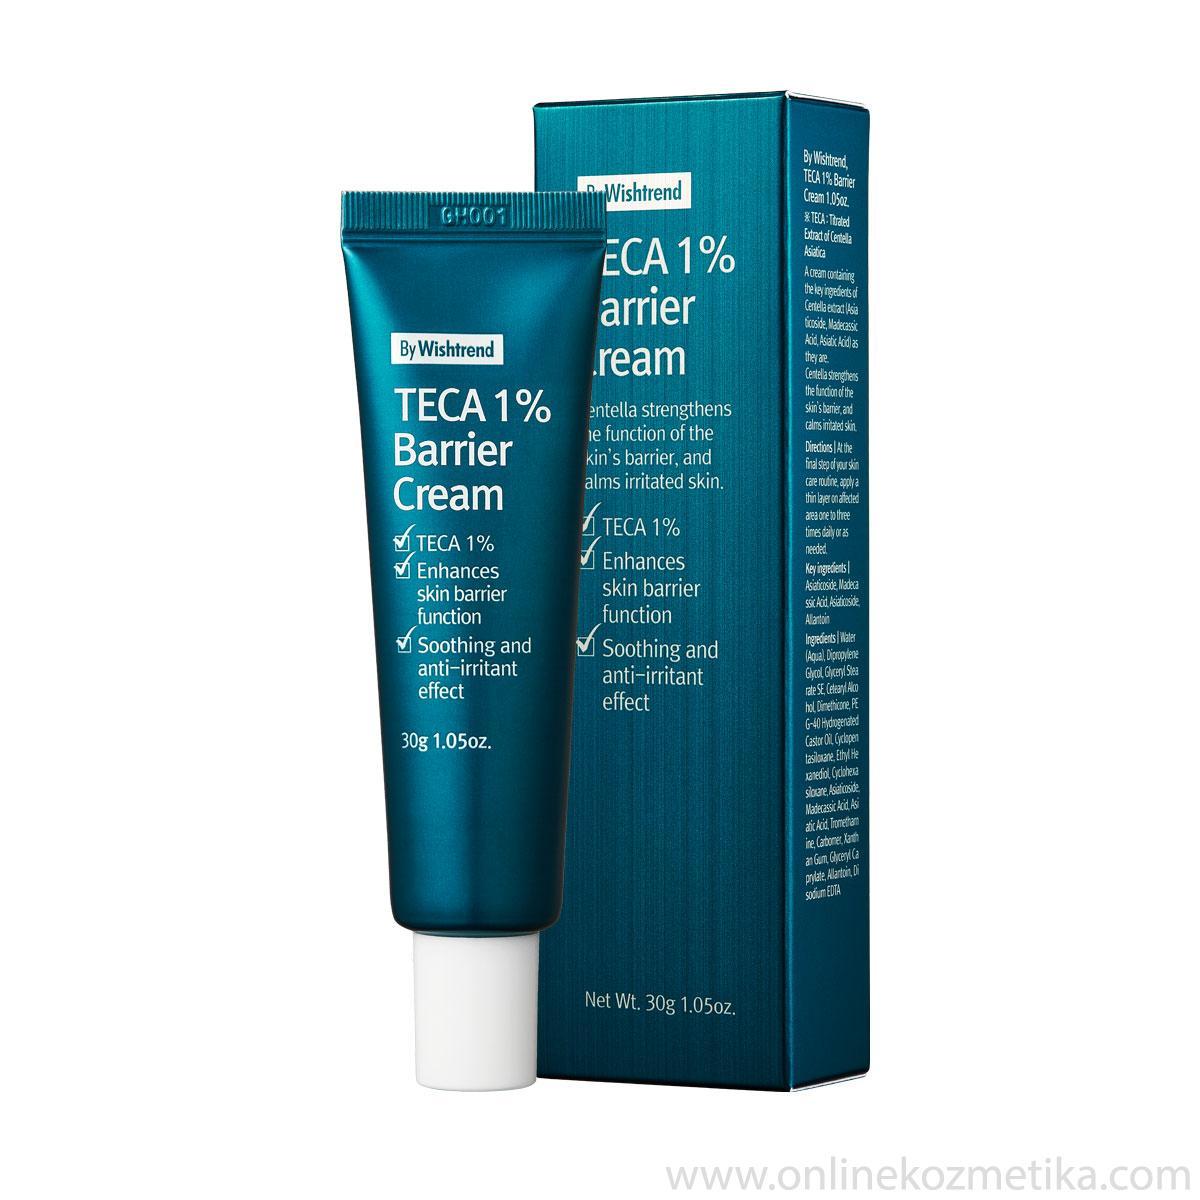 BY WISHTREND Teca 1% Barrier Cream 30ml